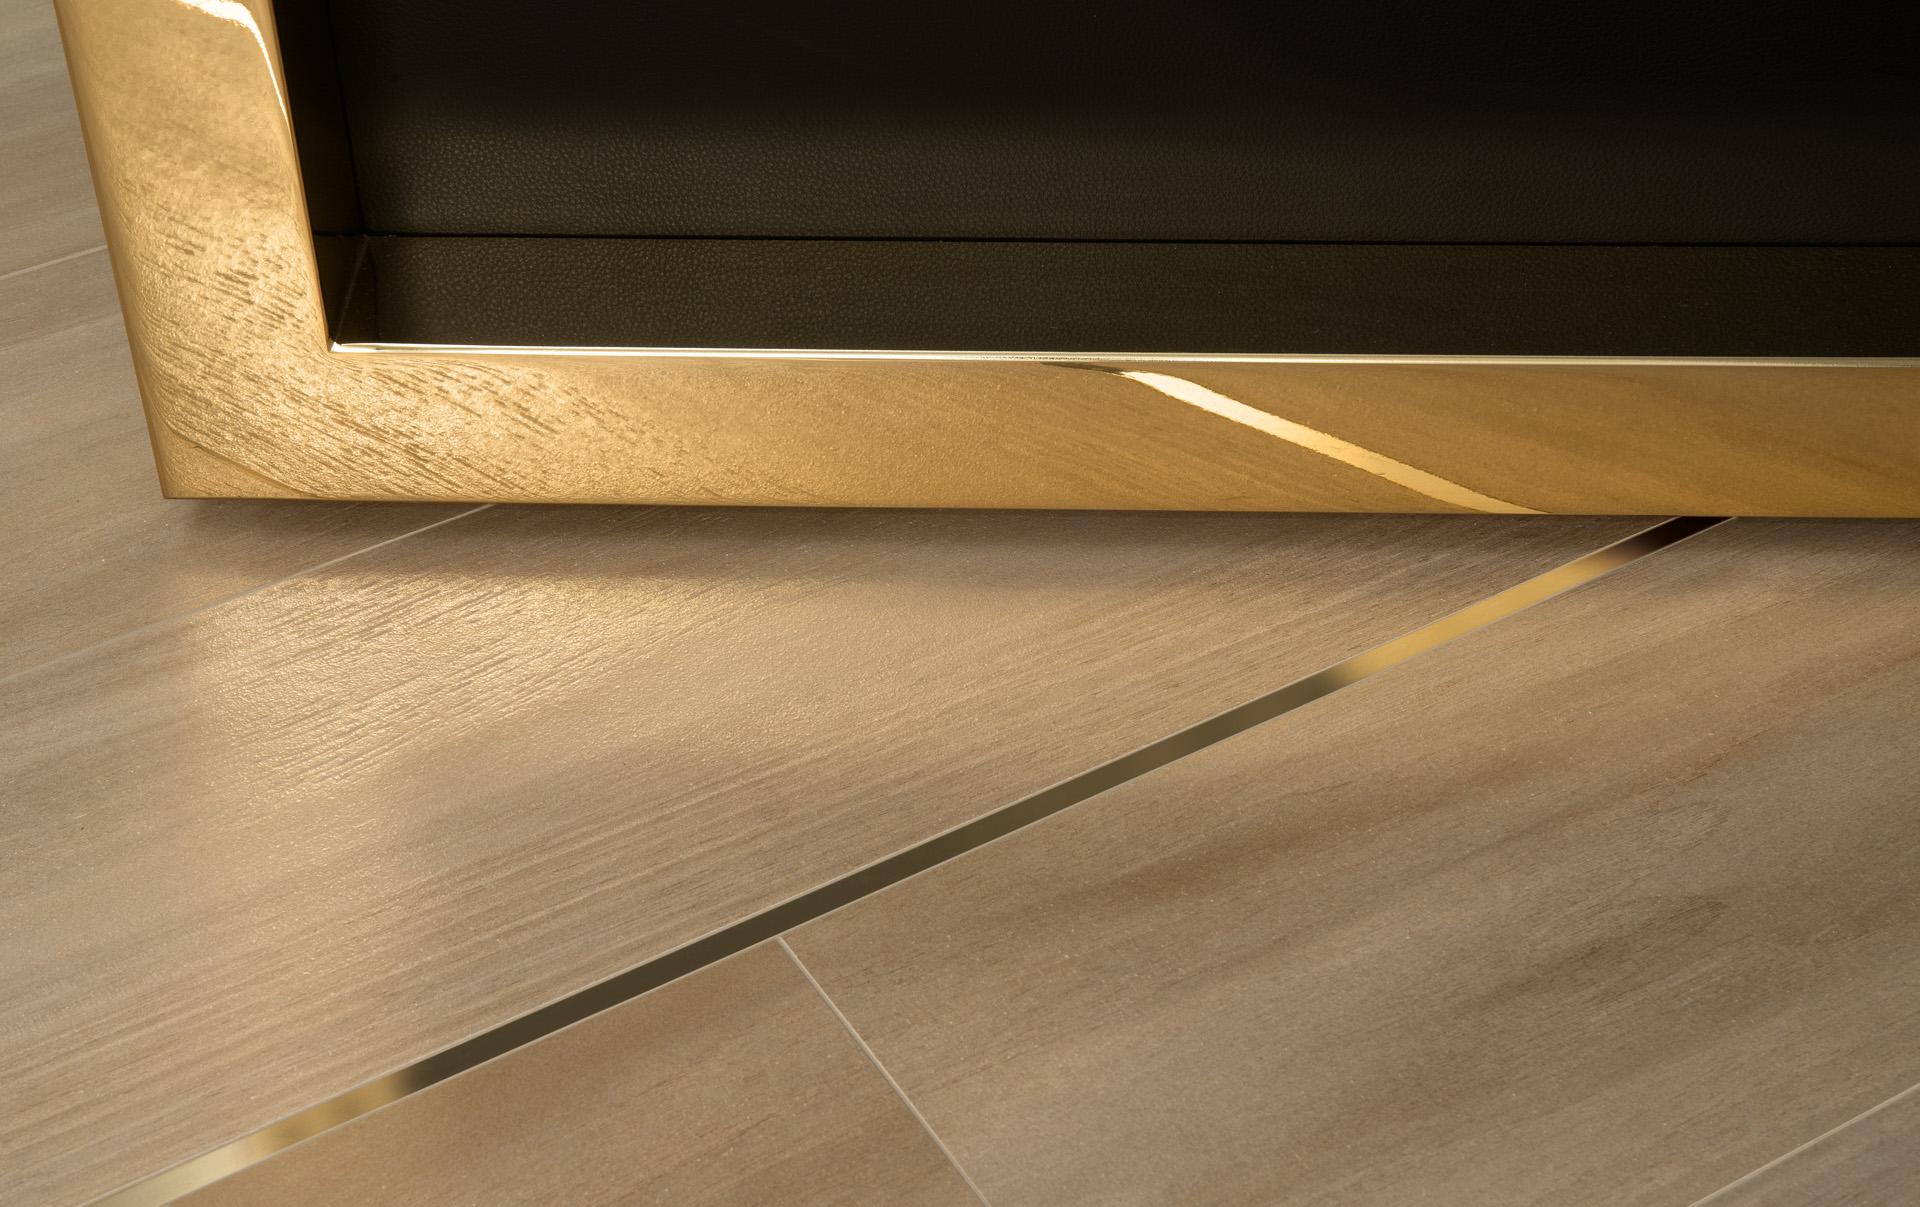 Galleria-Gold_38.jpg